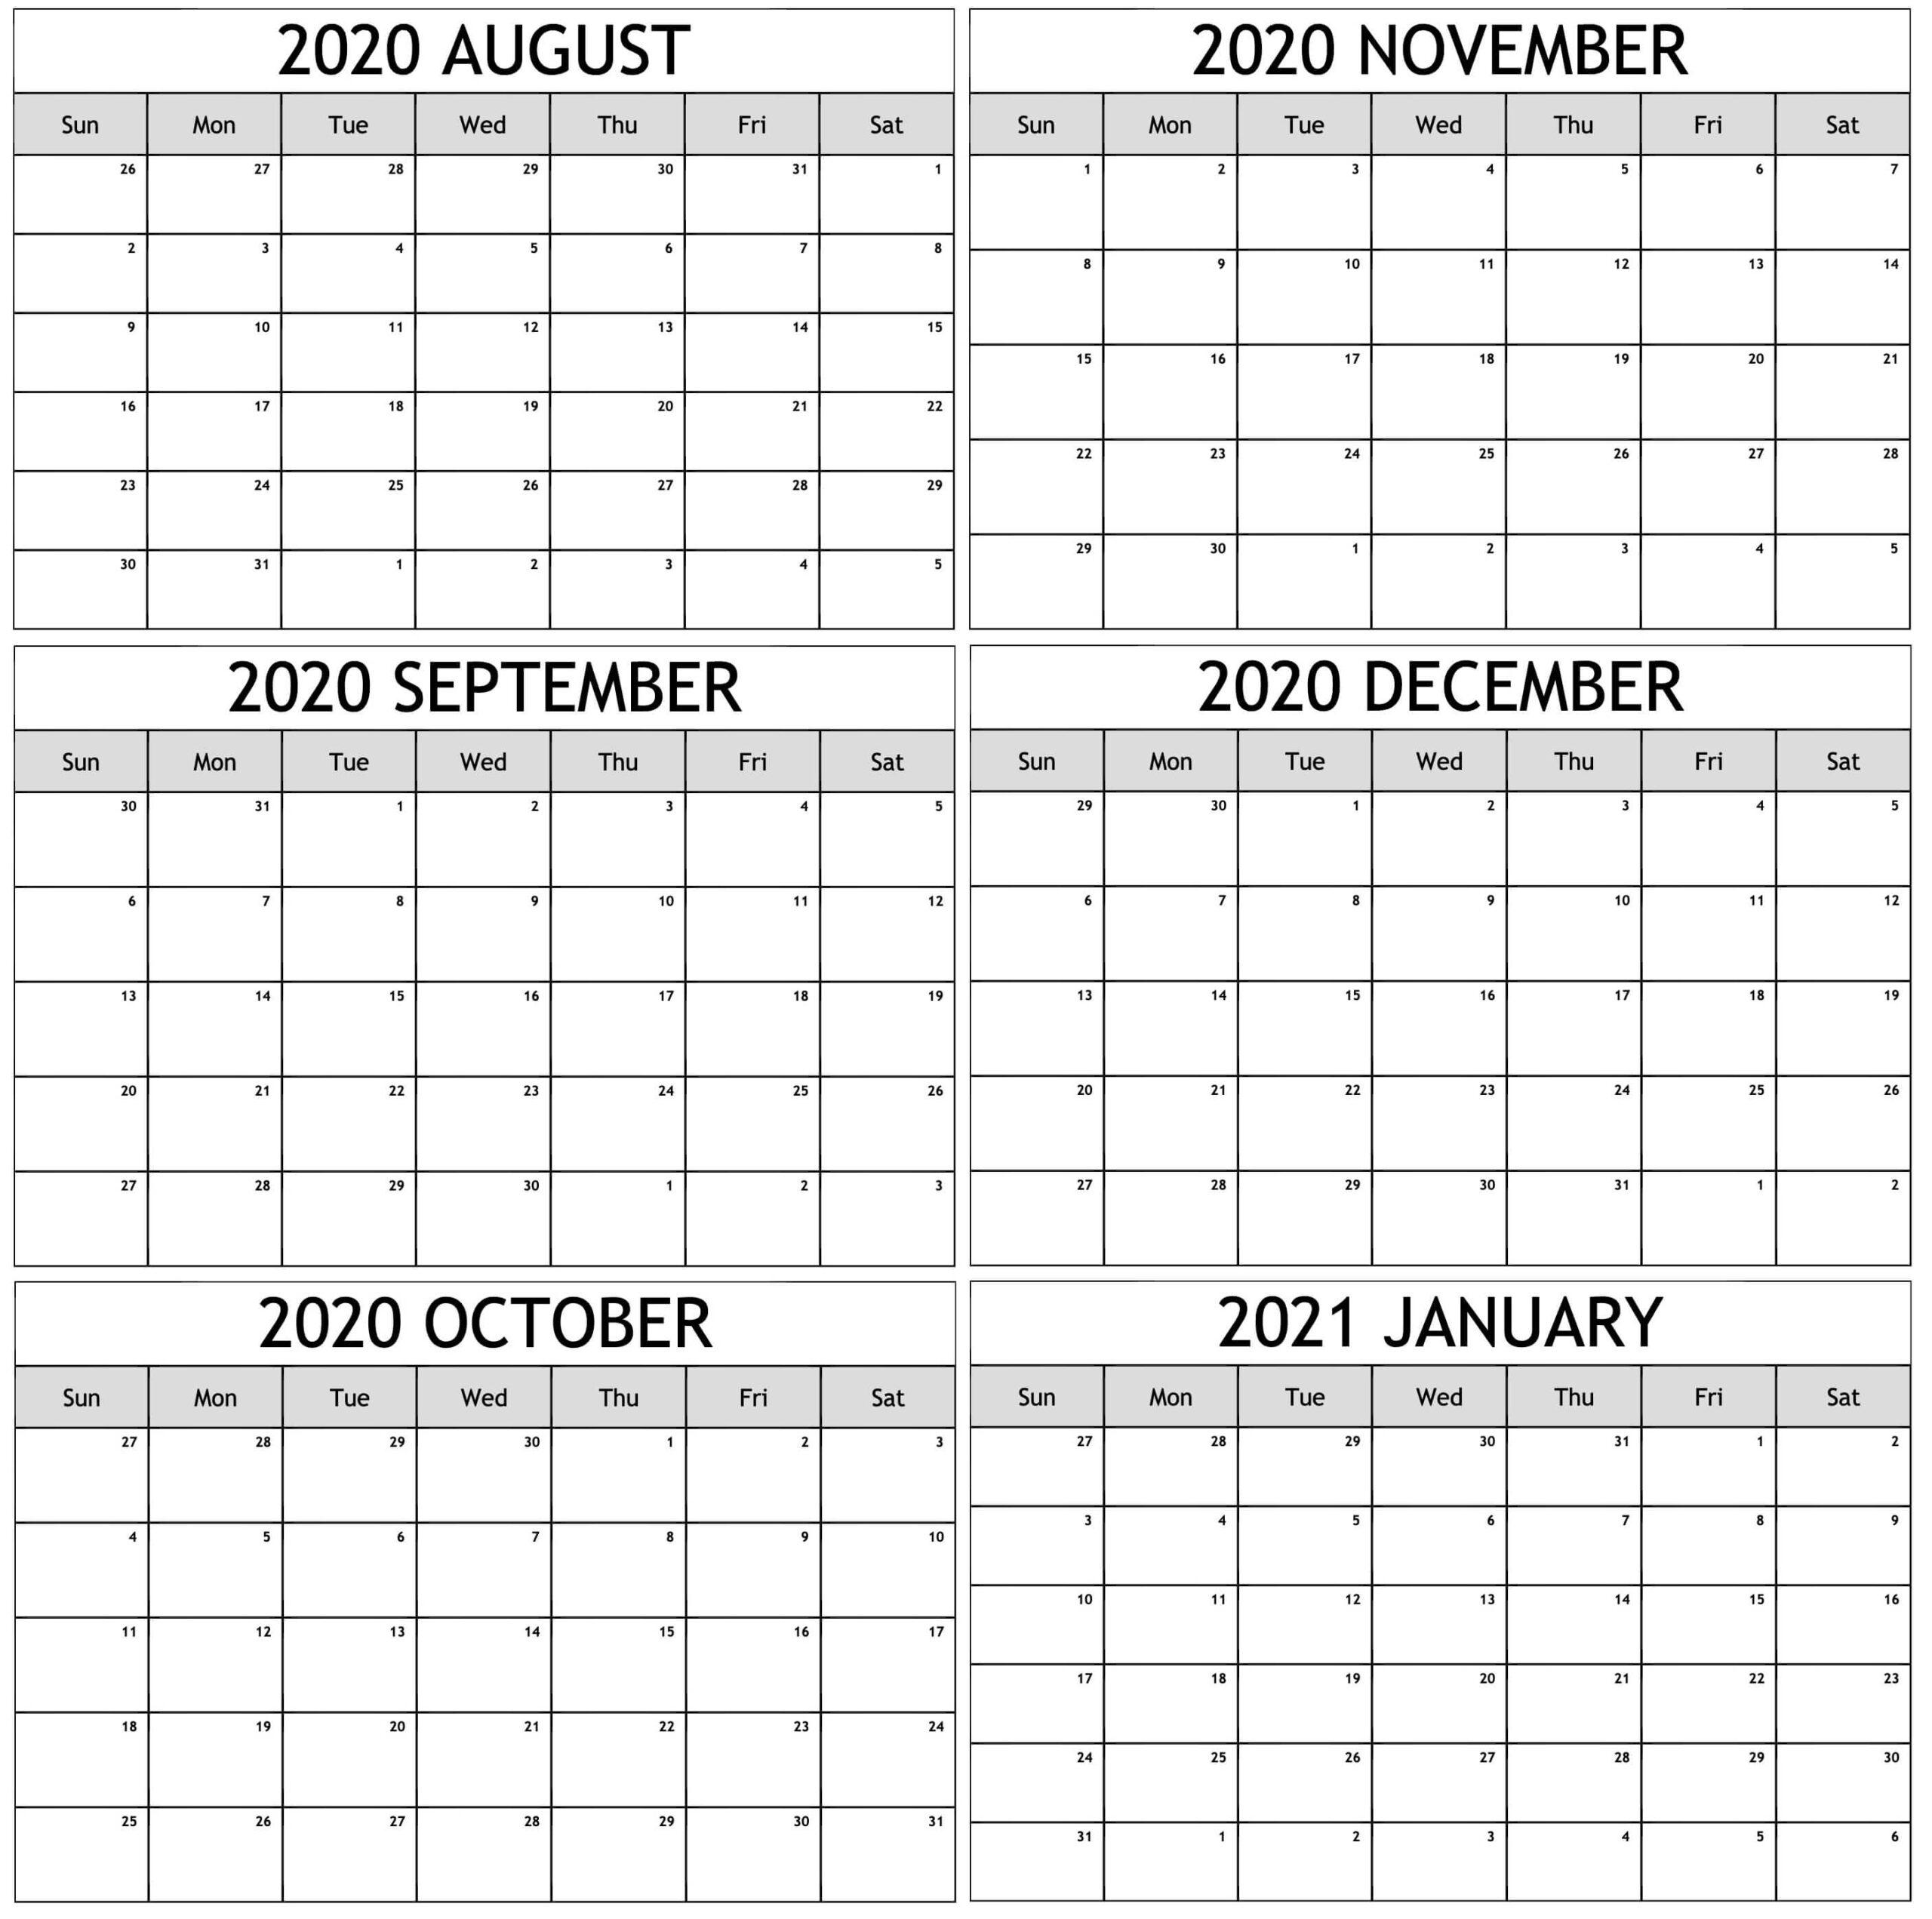 August 2020 To January 2021 Calendar Jpg - 2019 Calendars with Shift Schedule Jan 2021